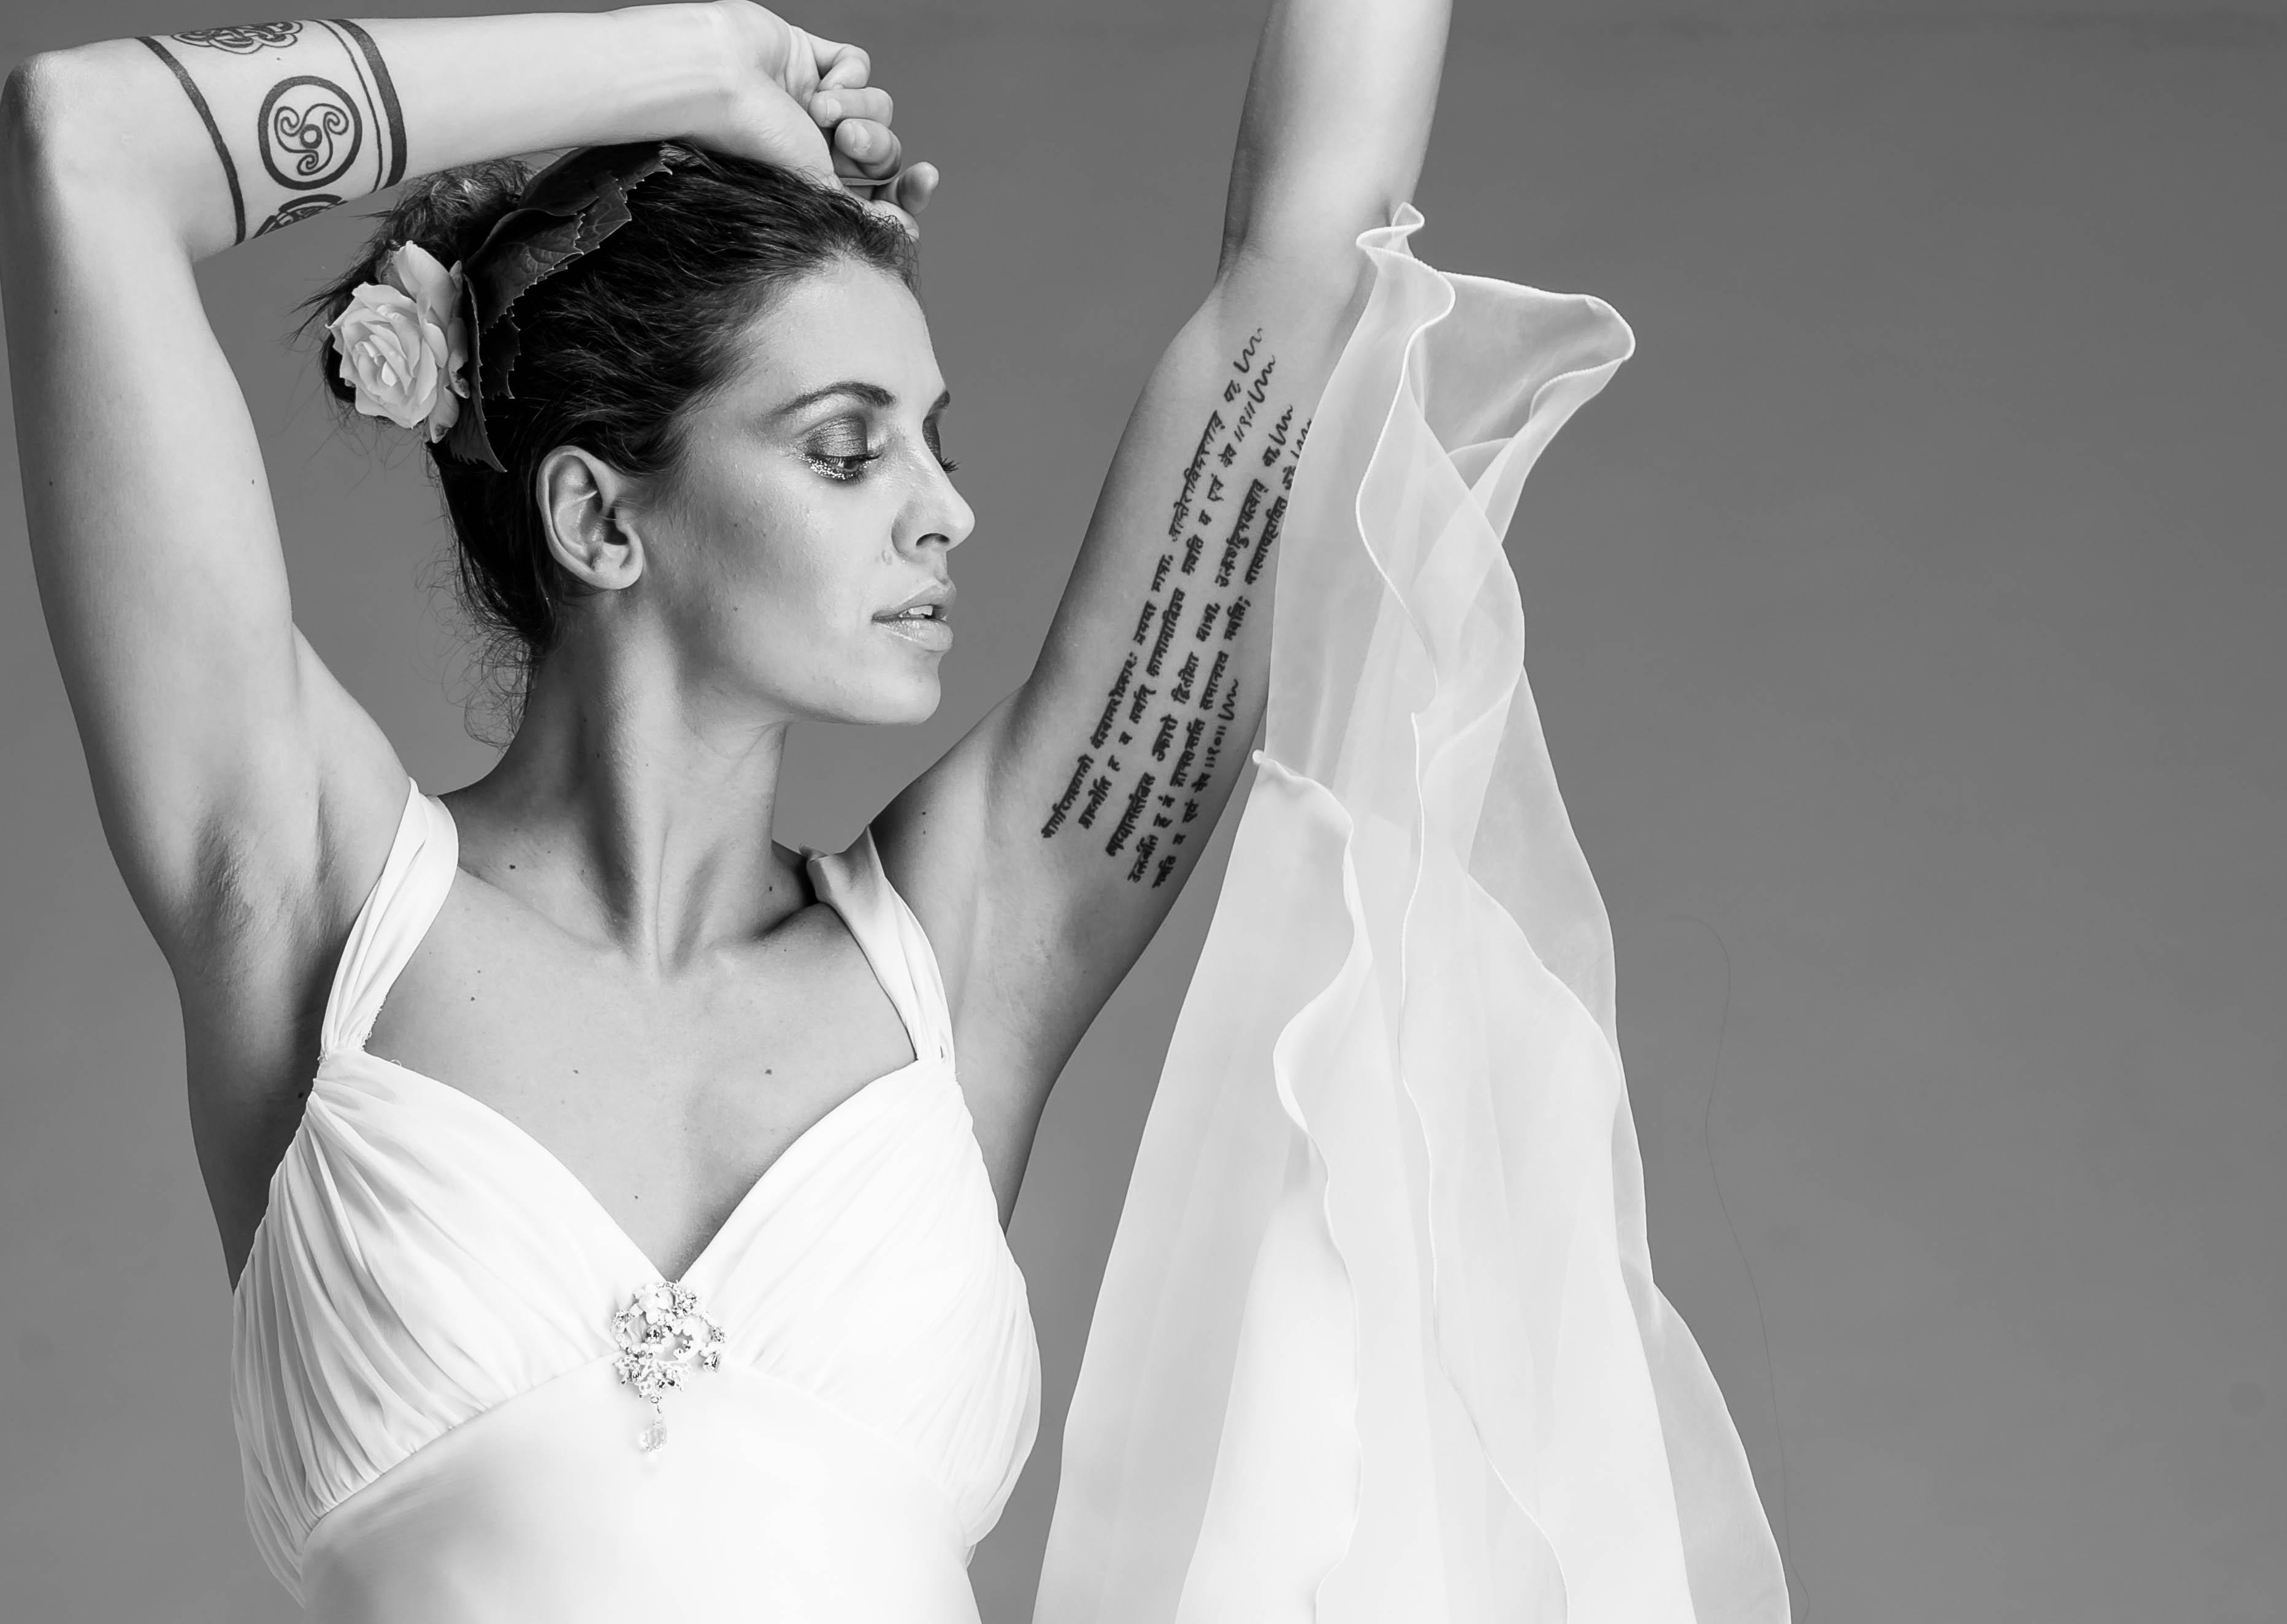 Wallpaper : model, portrait, long hair, tattoo, fashion, standing ...